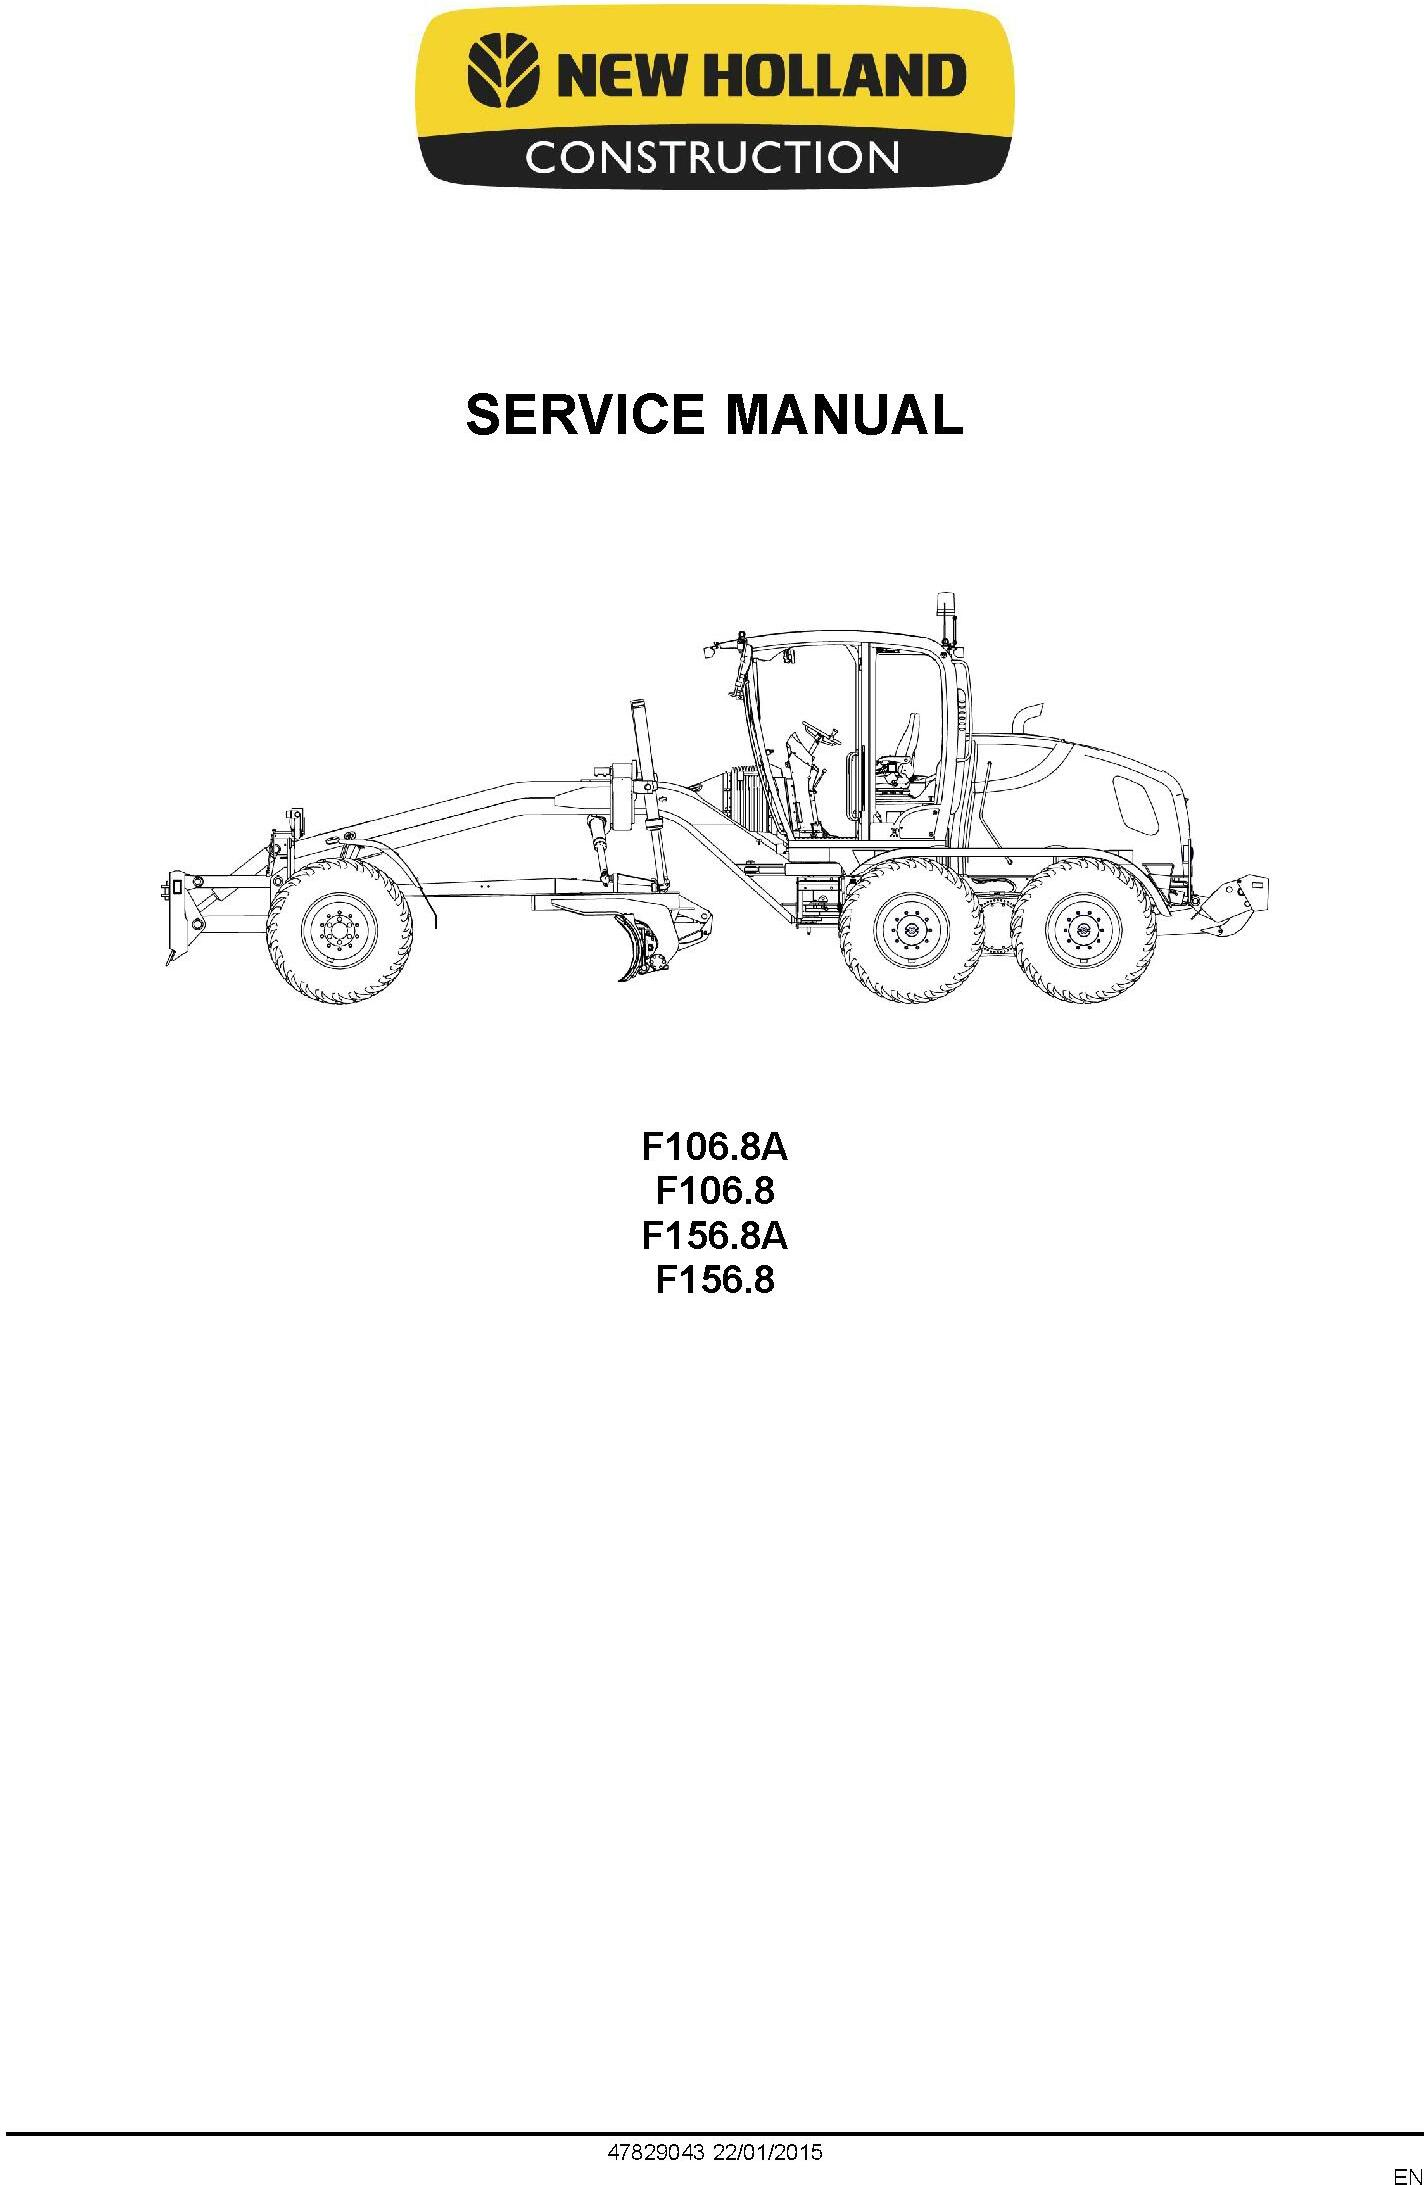 New Holland F106.8, F106.8A, F156.8, F156.8A Motor grader Service Manual - 1